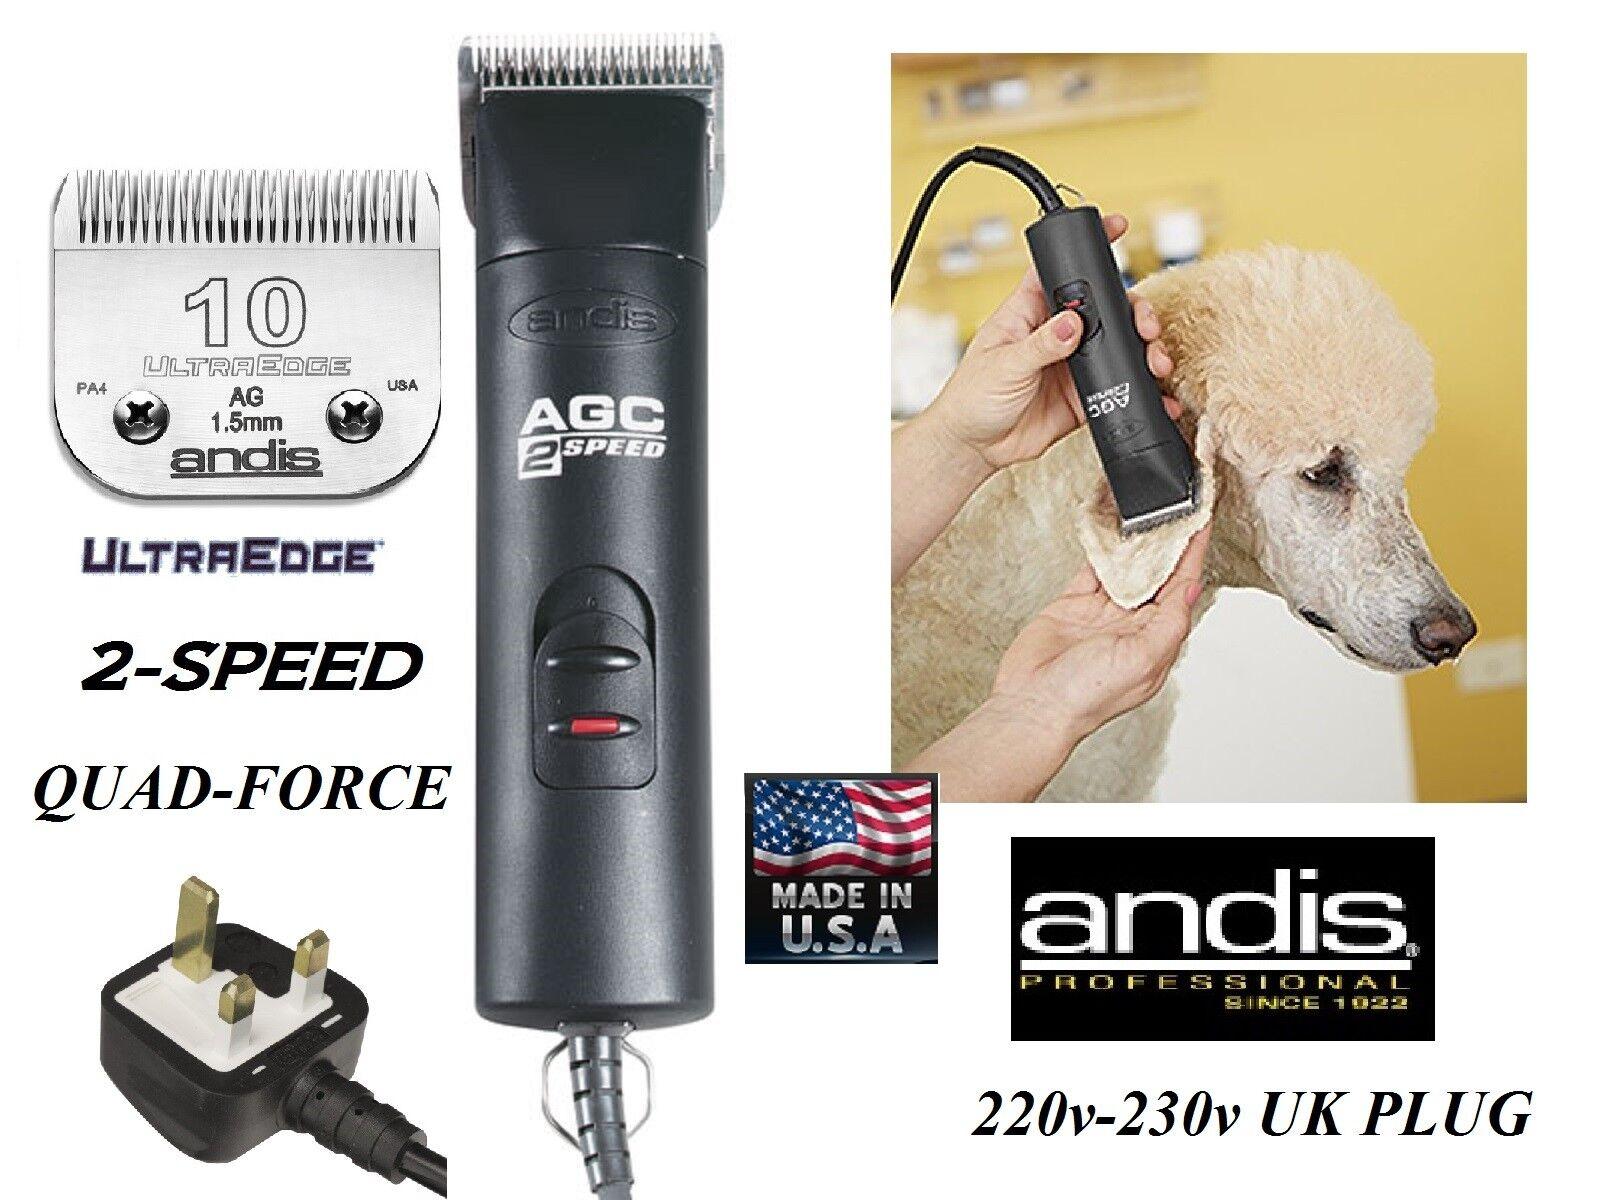 Andis Ultraedge Agc pro 2 Velocità Tosatrice Set&10 Lama 220v 230v 240v Spina UK